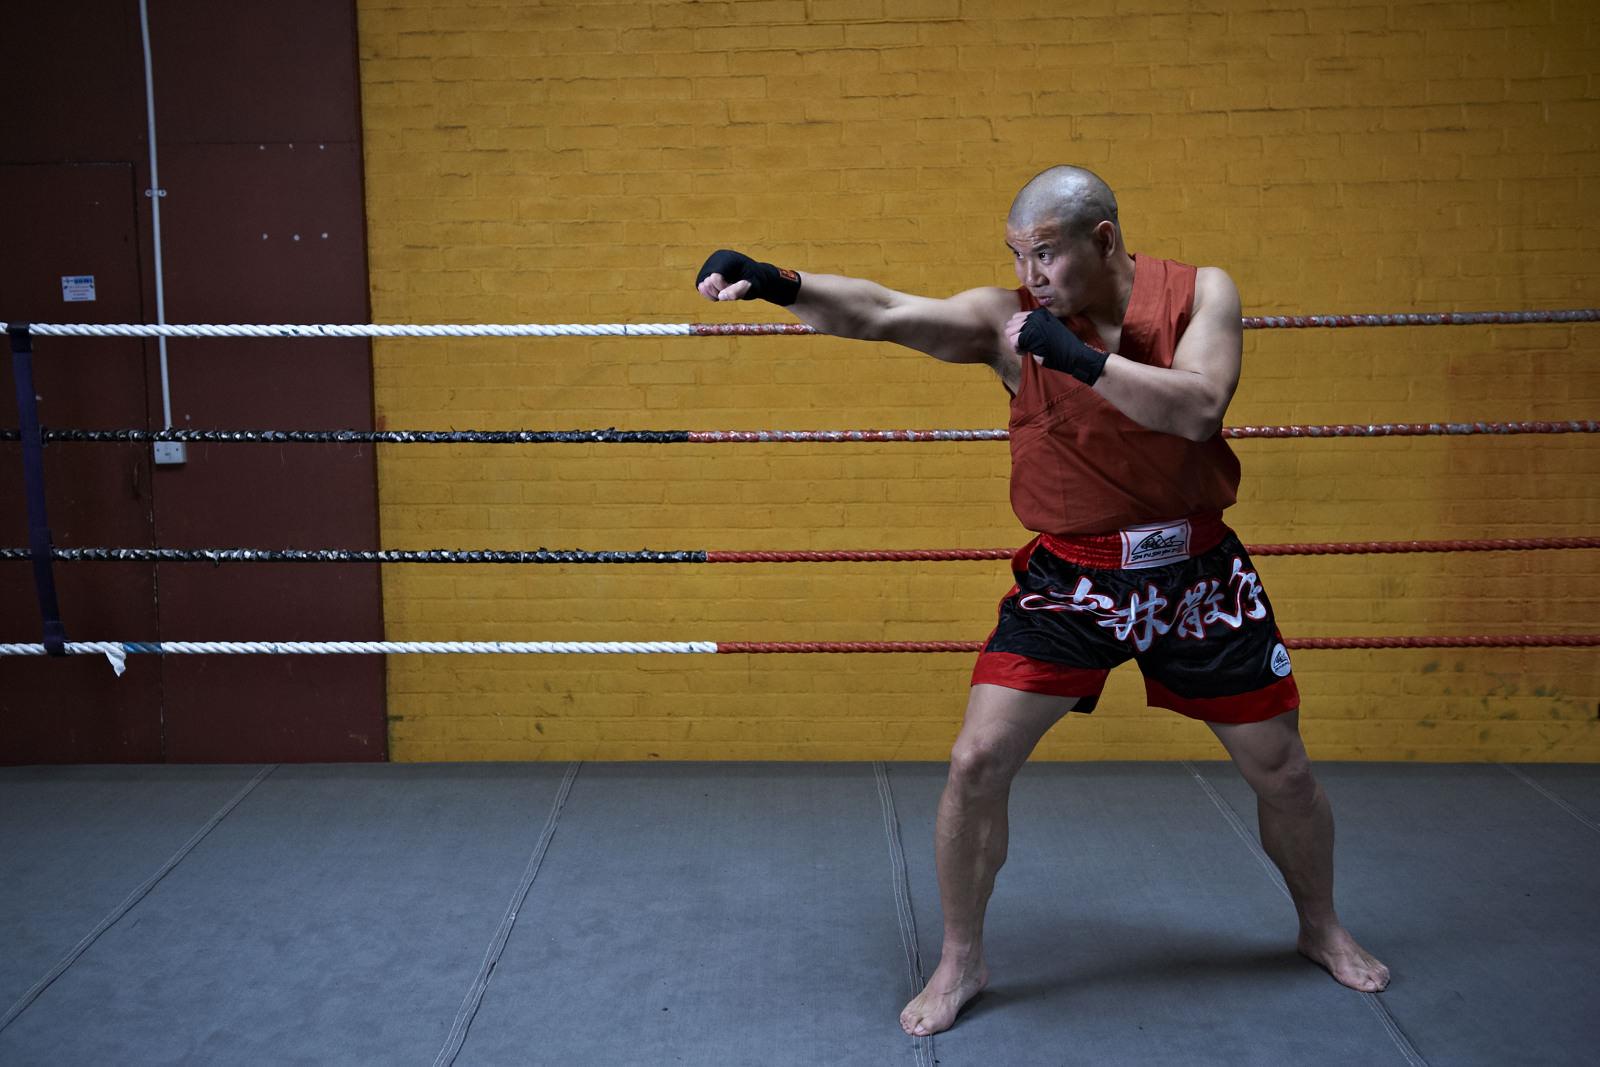 Shaolin temple uk shifu yanzi kick 9.jpg